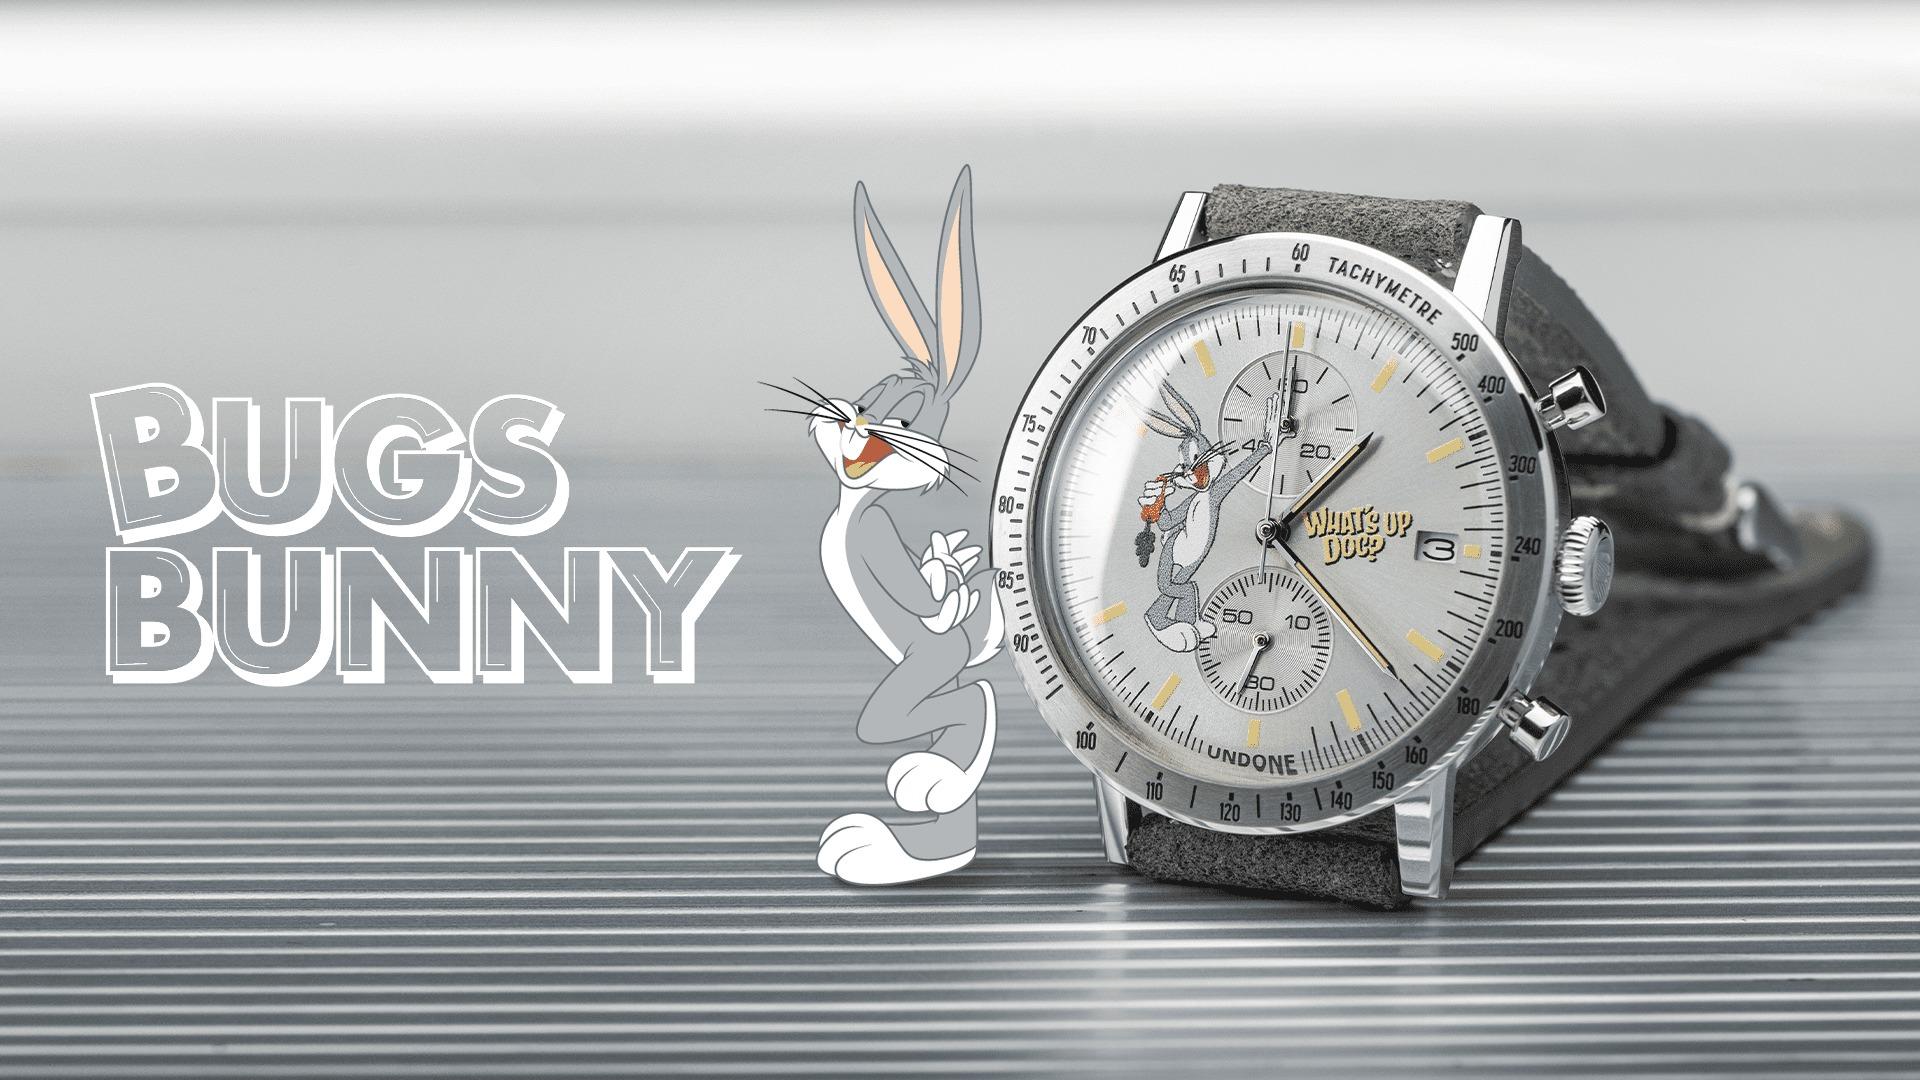 UNDONE アンダーン コラボ腕時計 bugs_bunny バックス バニー